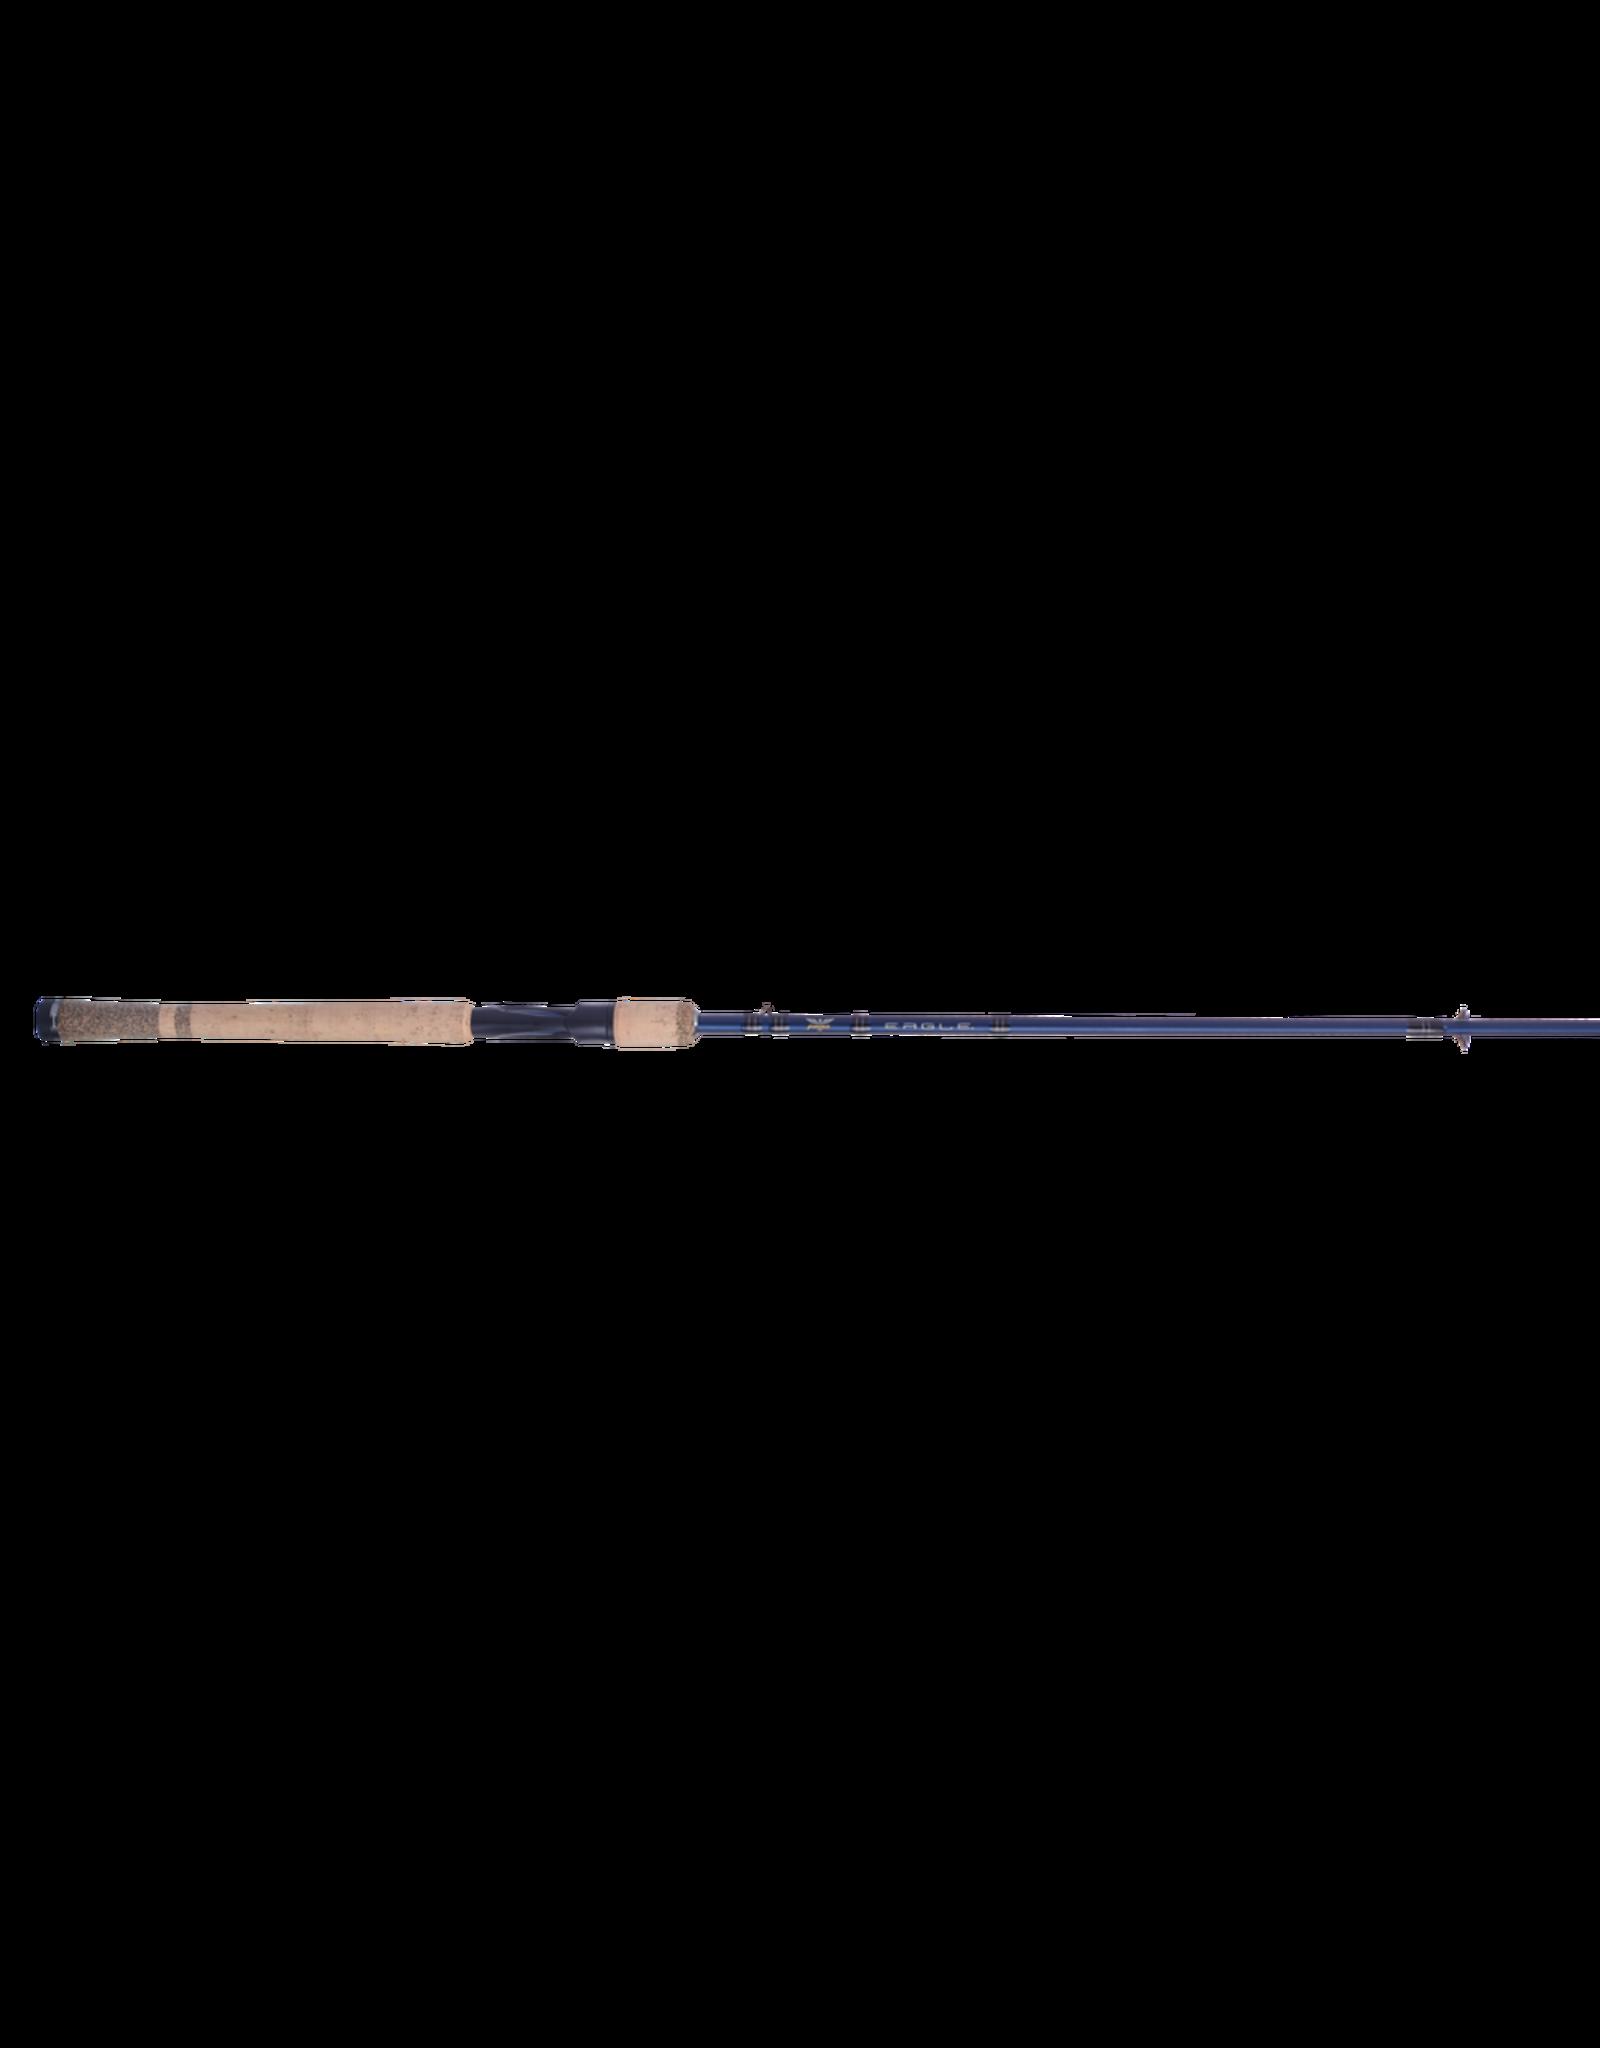 "Fenwick Fenwick Eagle Salmon/Steelhead Spin 10'6"" Medium Heavy Power, Moderate Action"